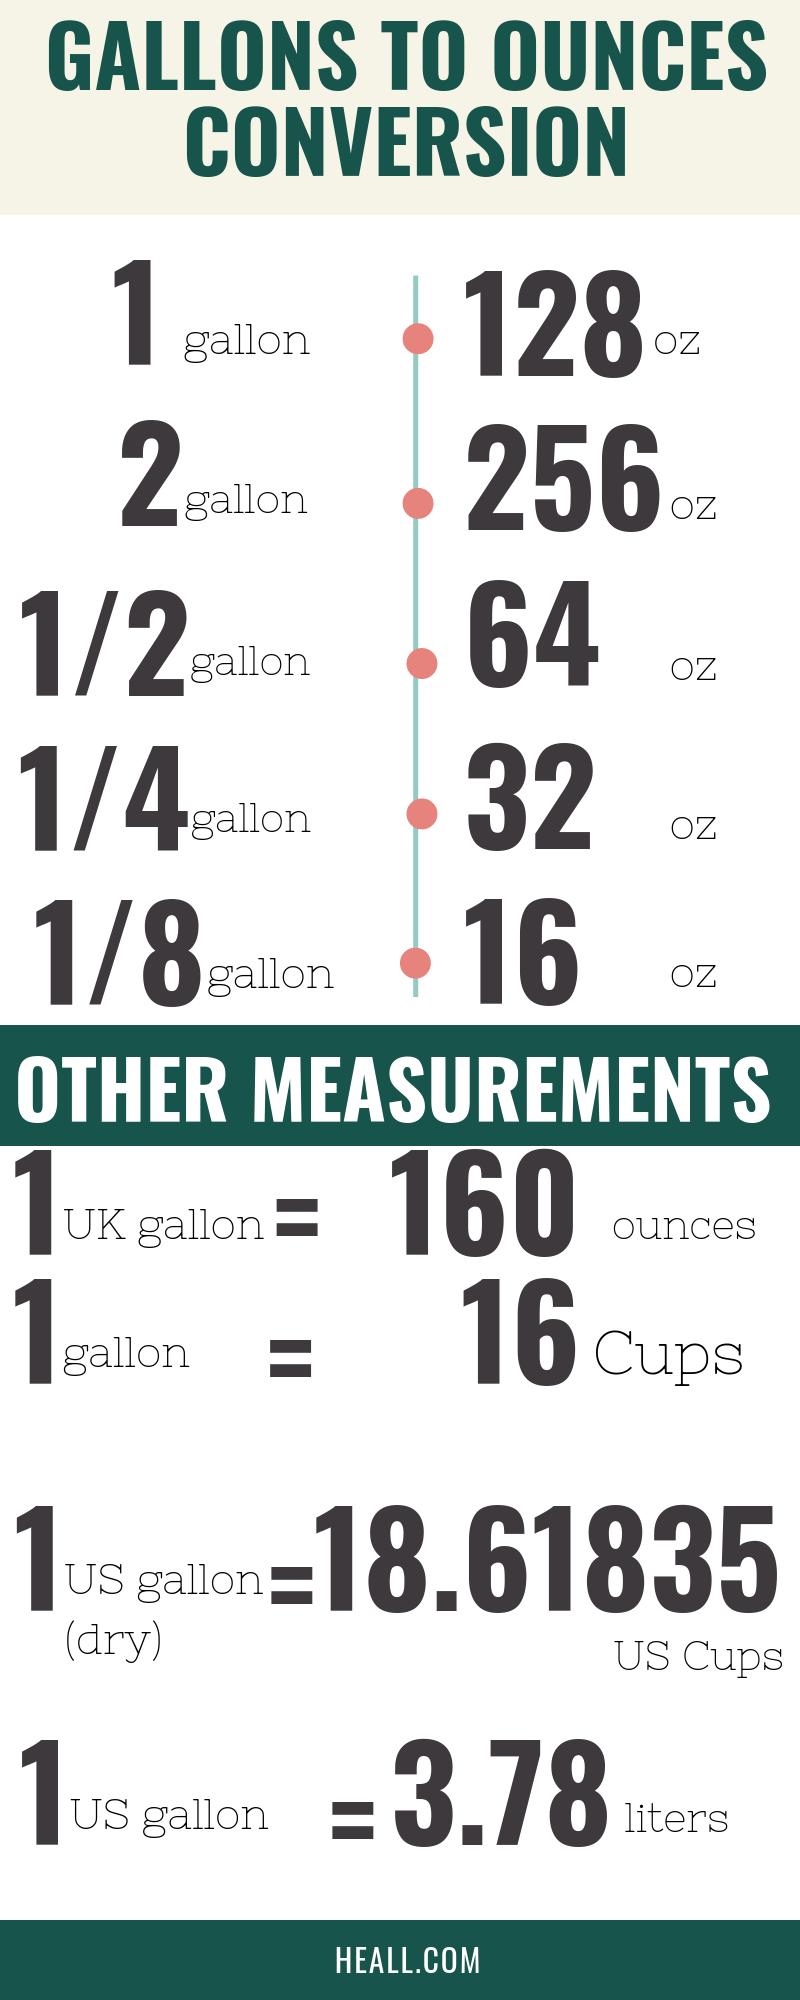 Gallons to ounces conversion